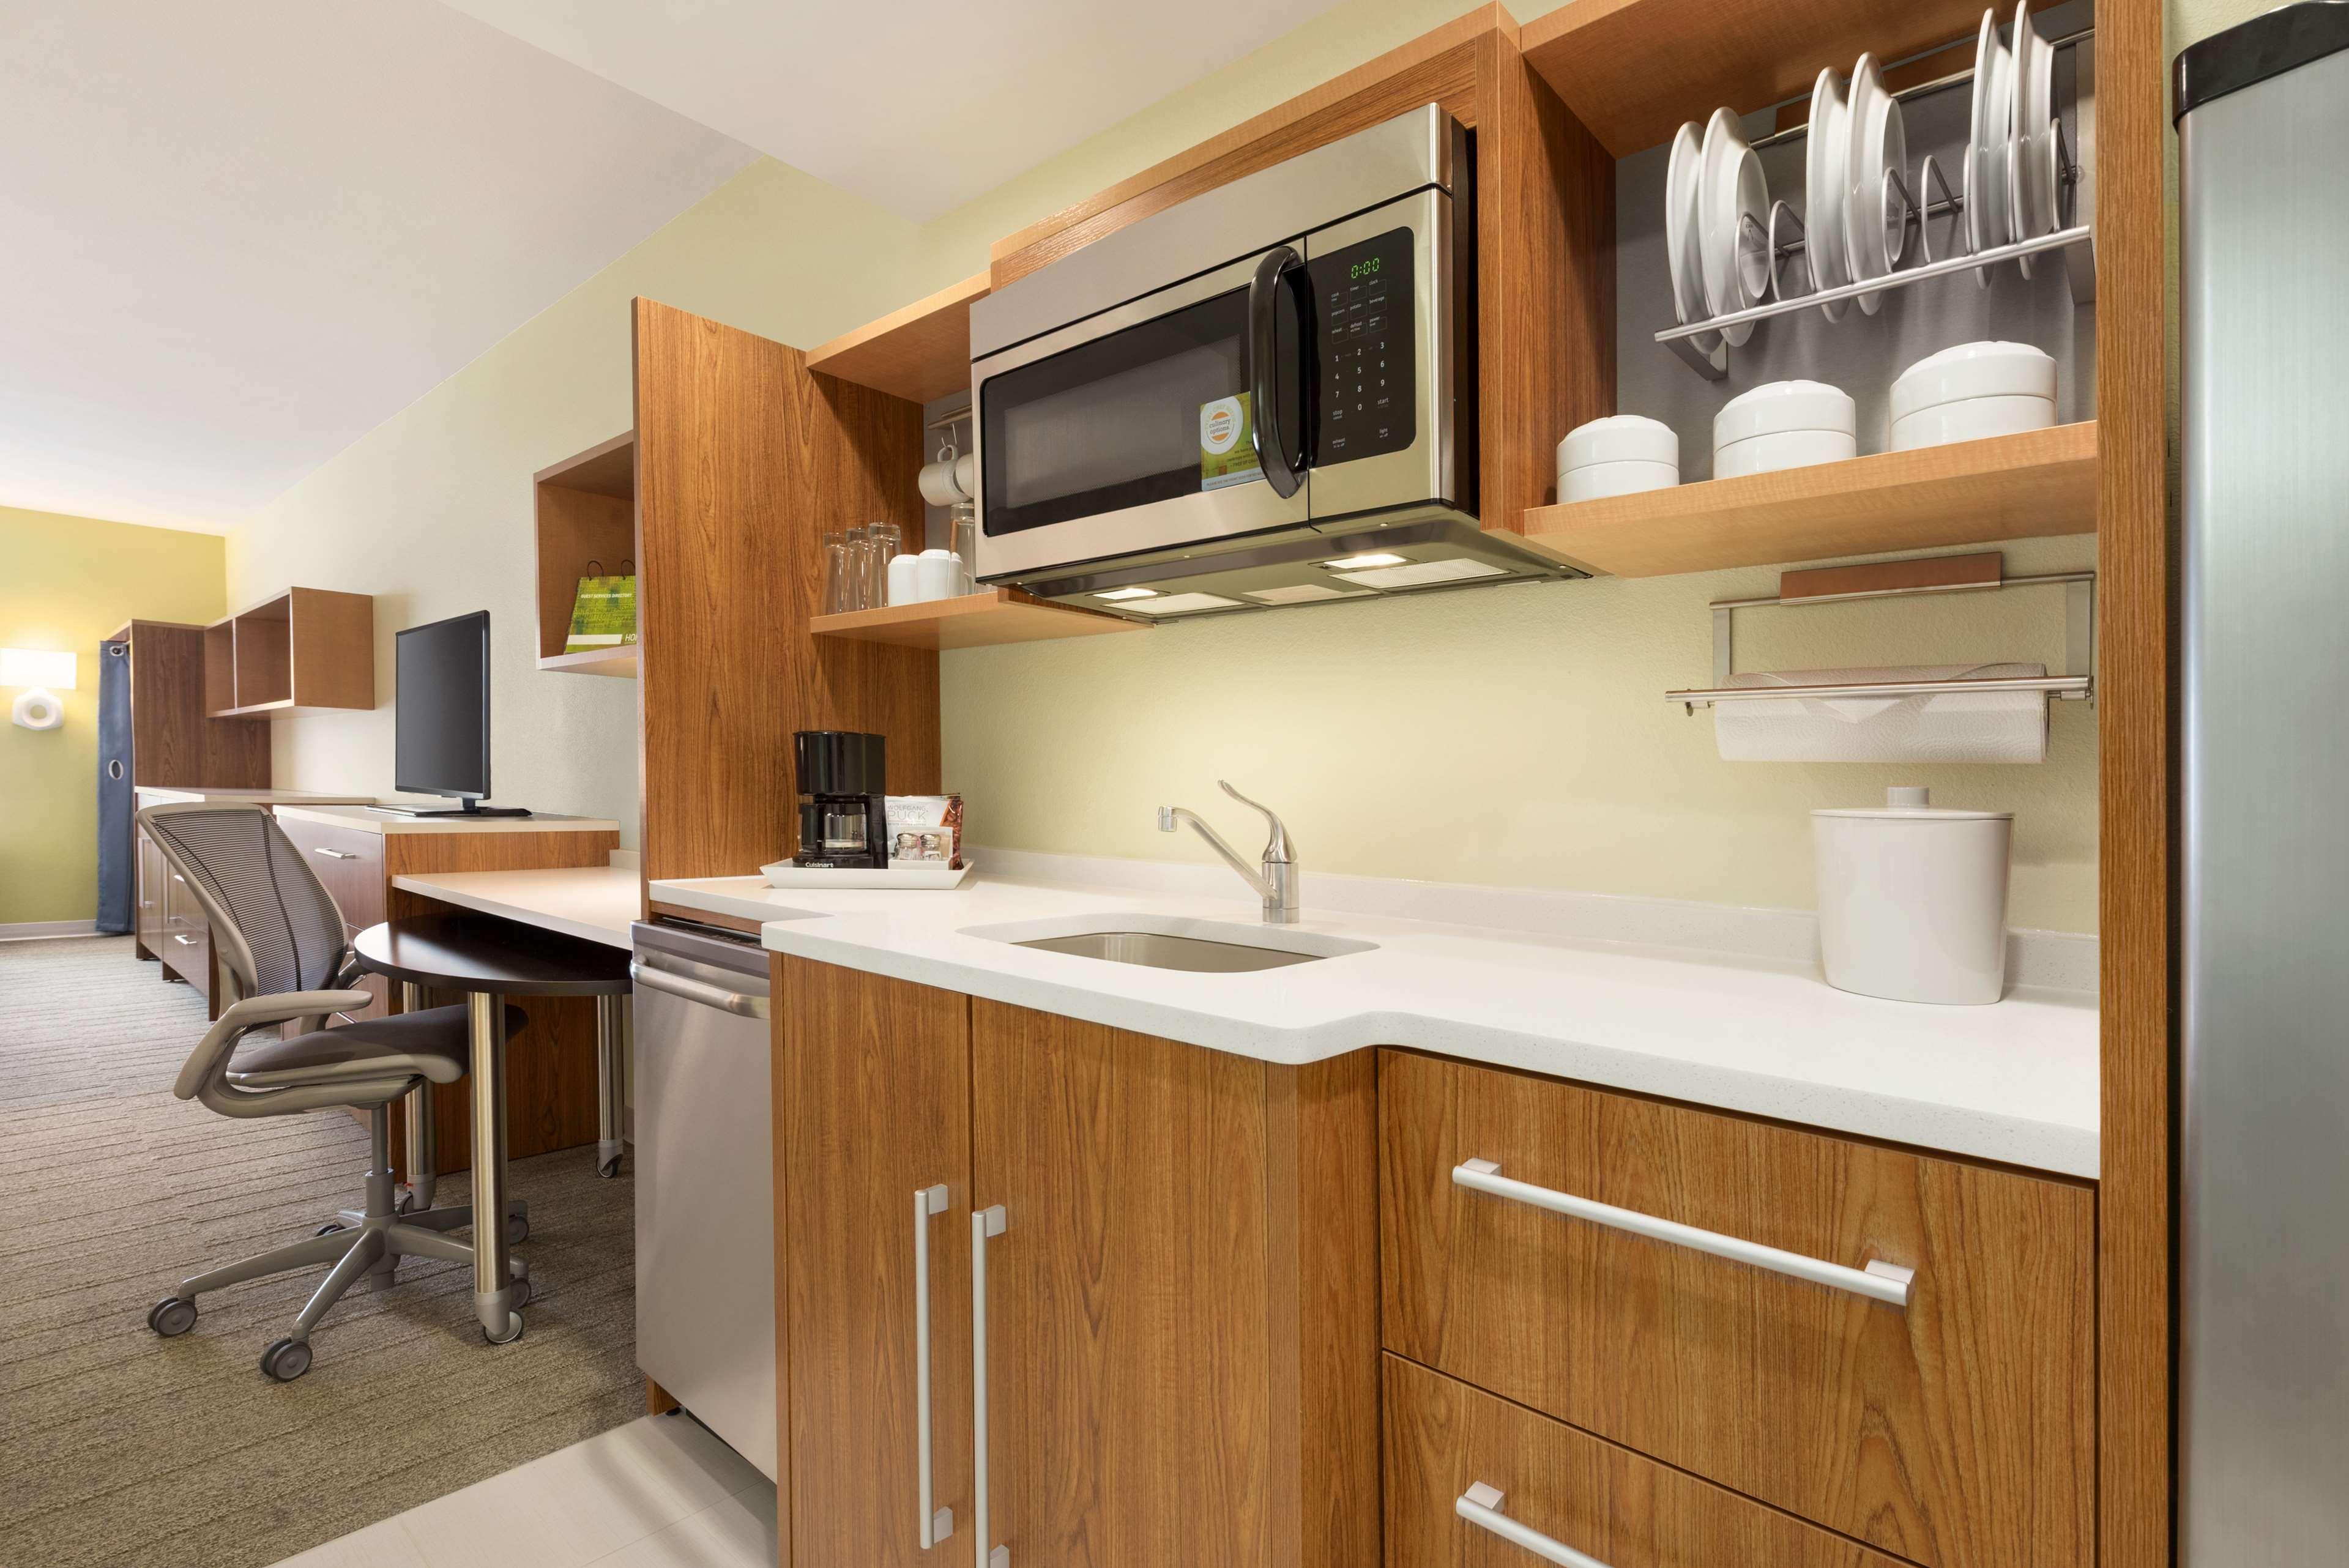 Home2 Suites by Hilton Roseville Minneapolis image 1